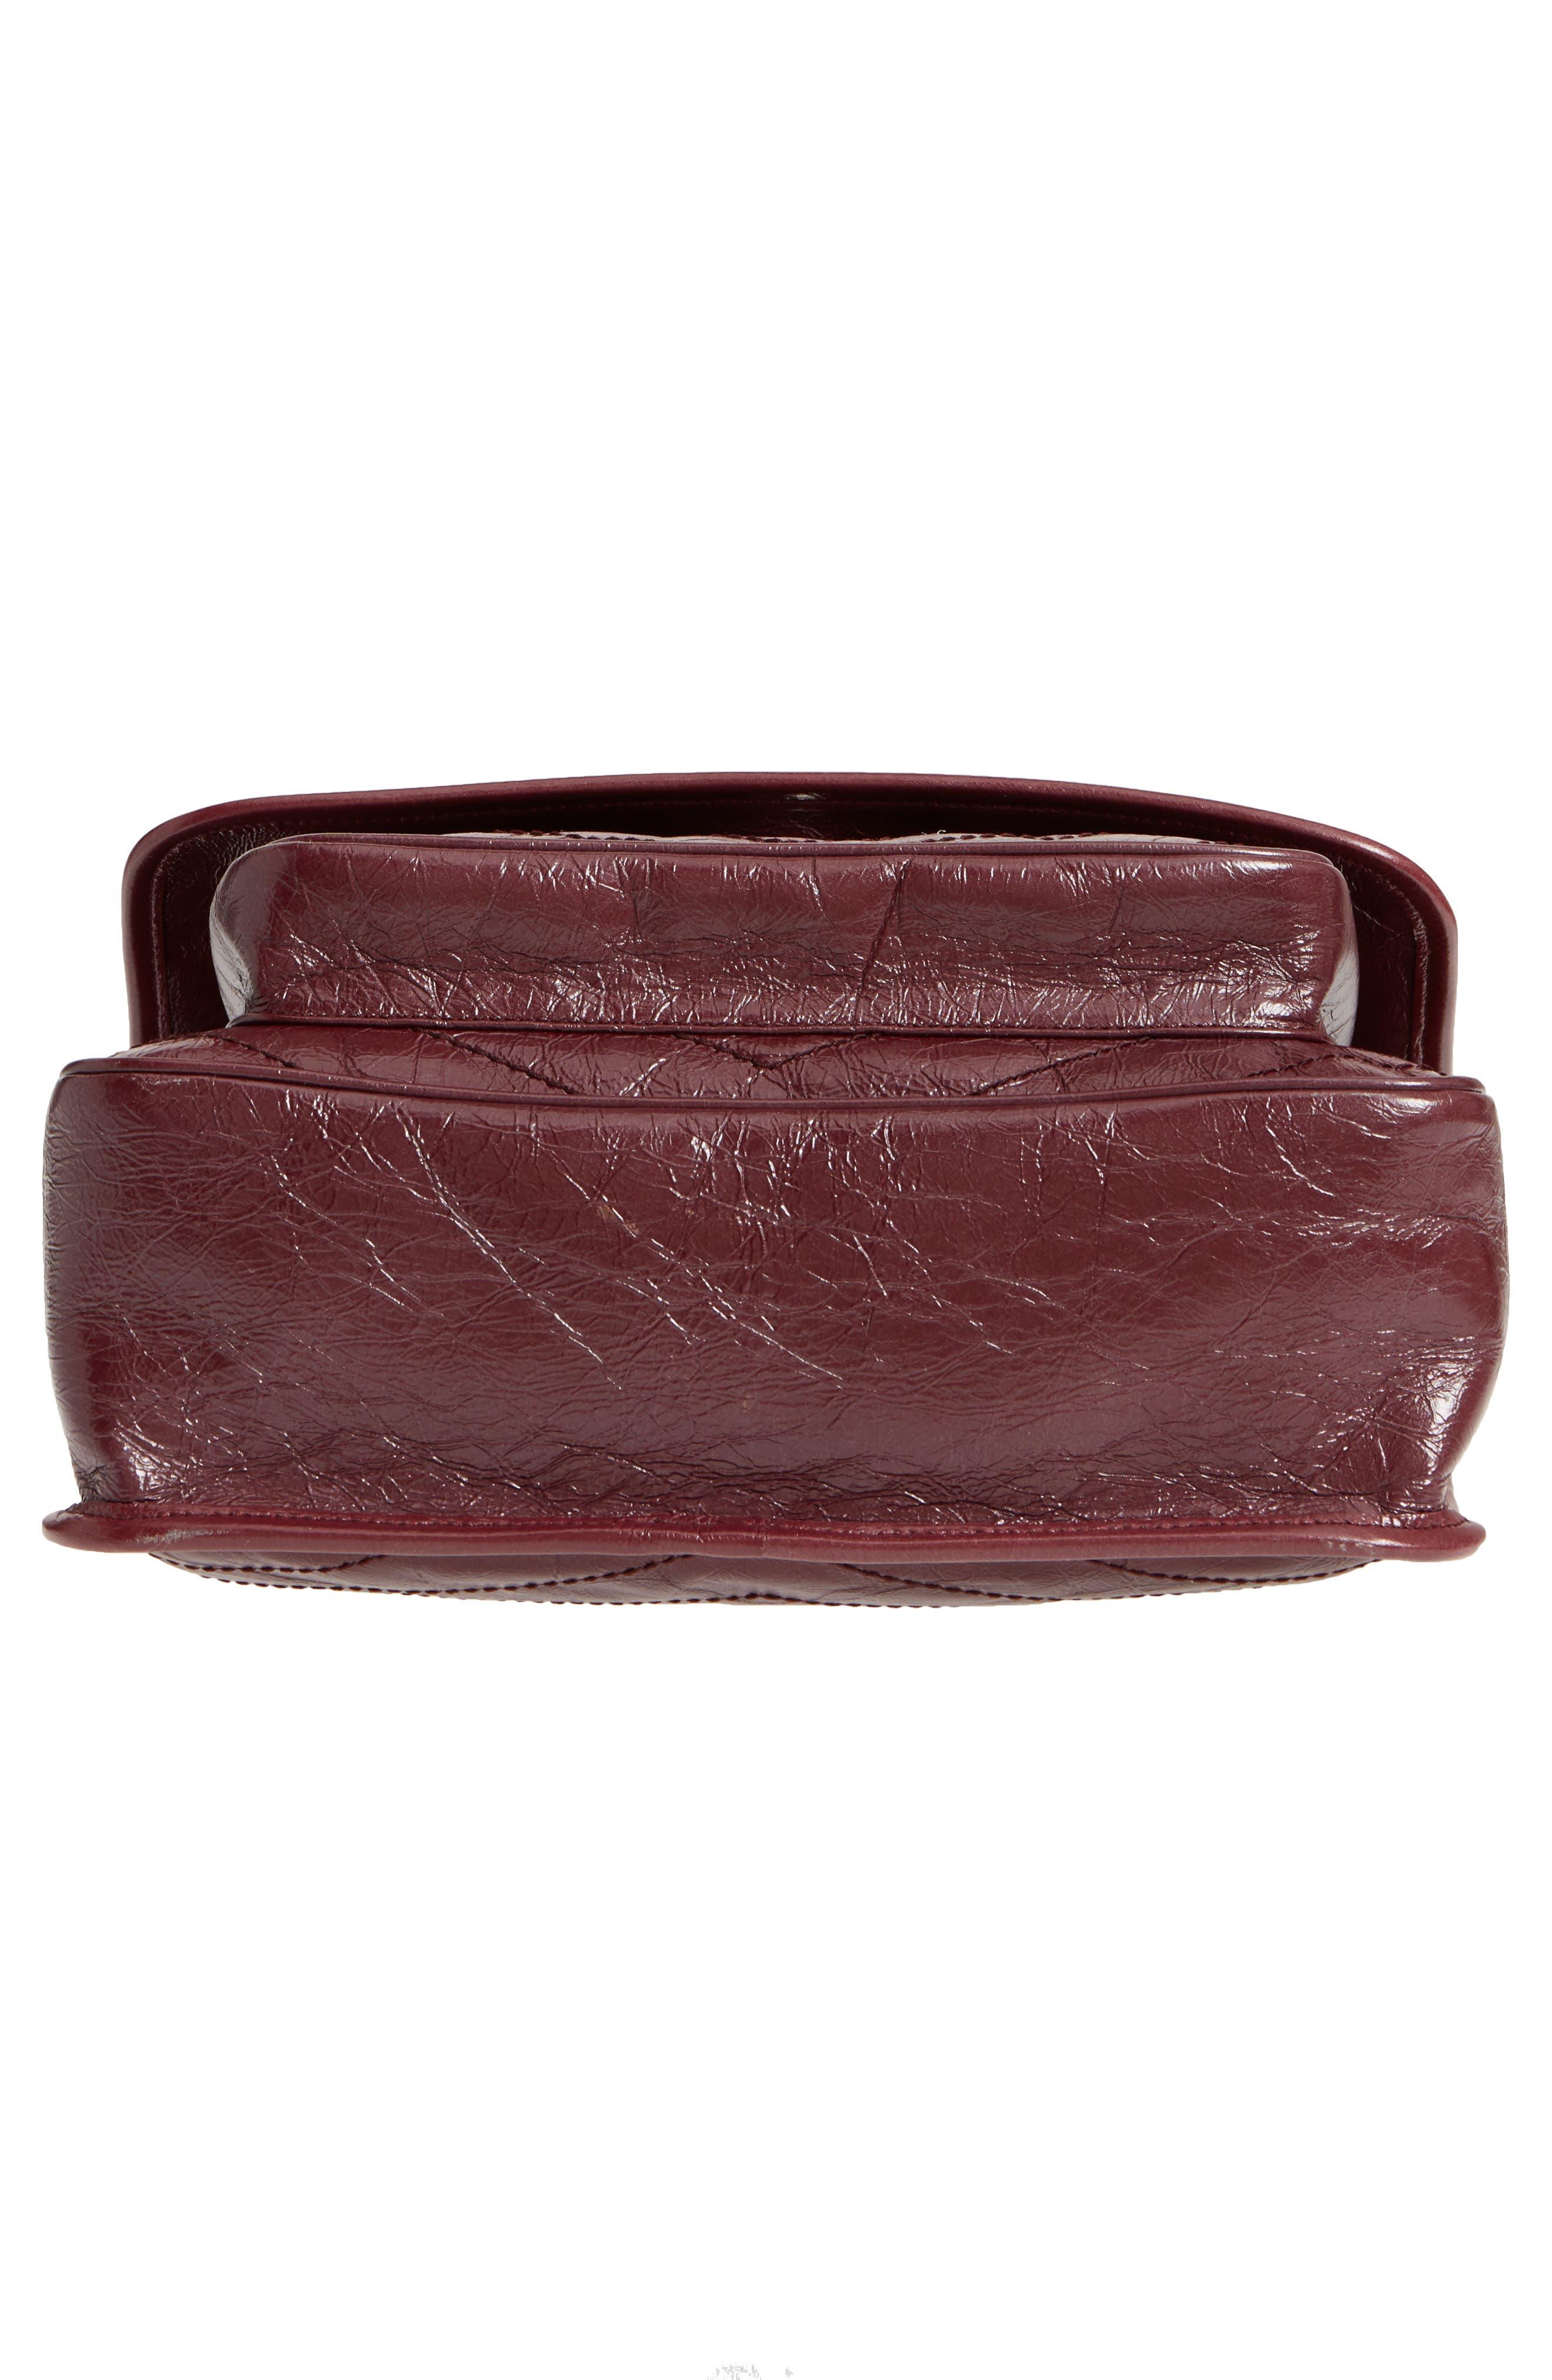 Medium Niki Leather Shoulder Bag,                             Alternate thumbnail 6, color,                             Rouge Legion